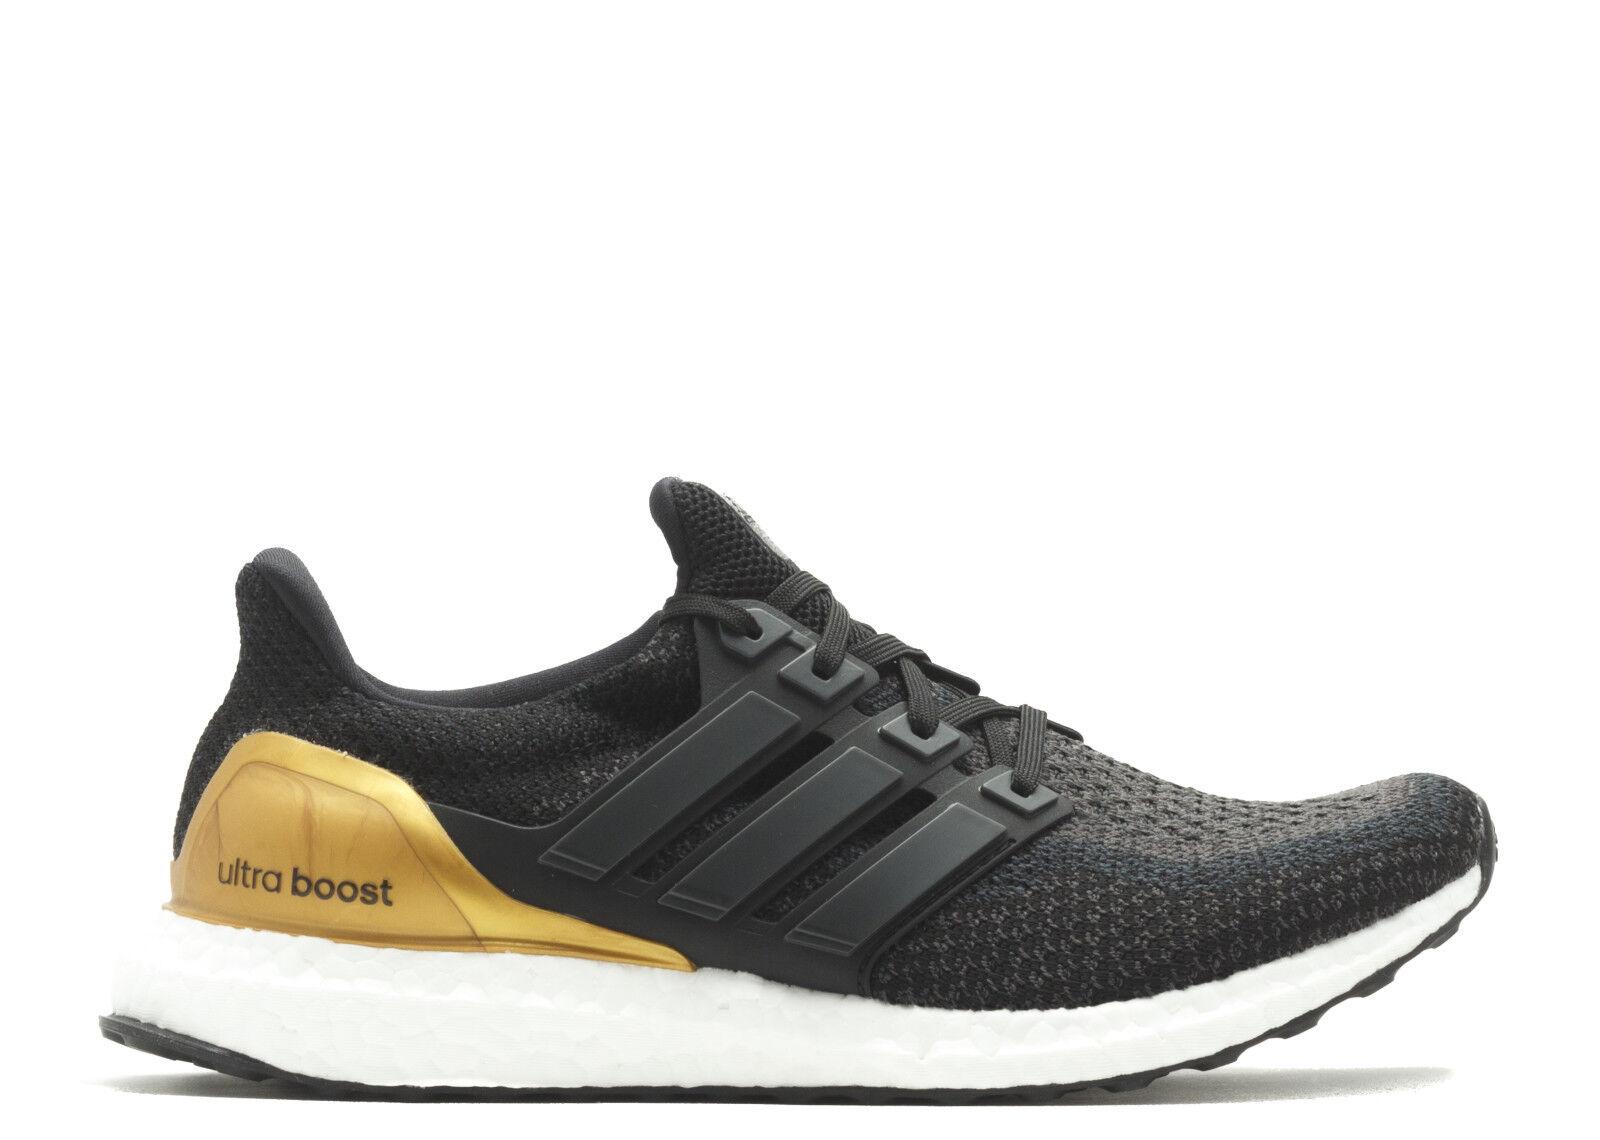 Adidas Ultra Boost 2.0 UCLA Bruins PE Size 12. BB0800 yeezy nmd pk